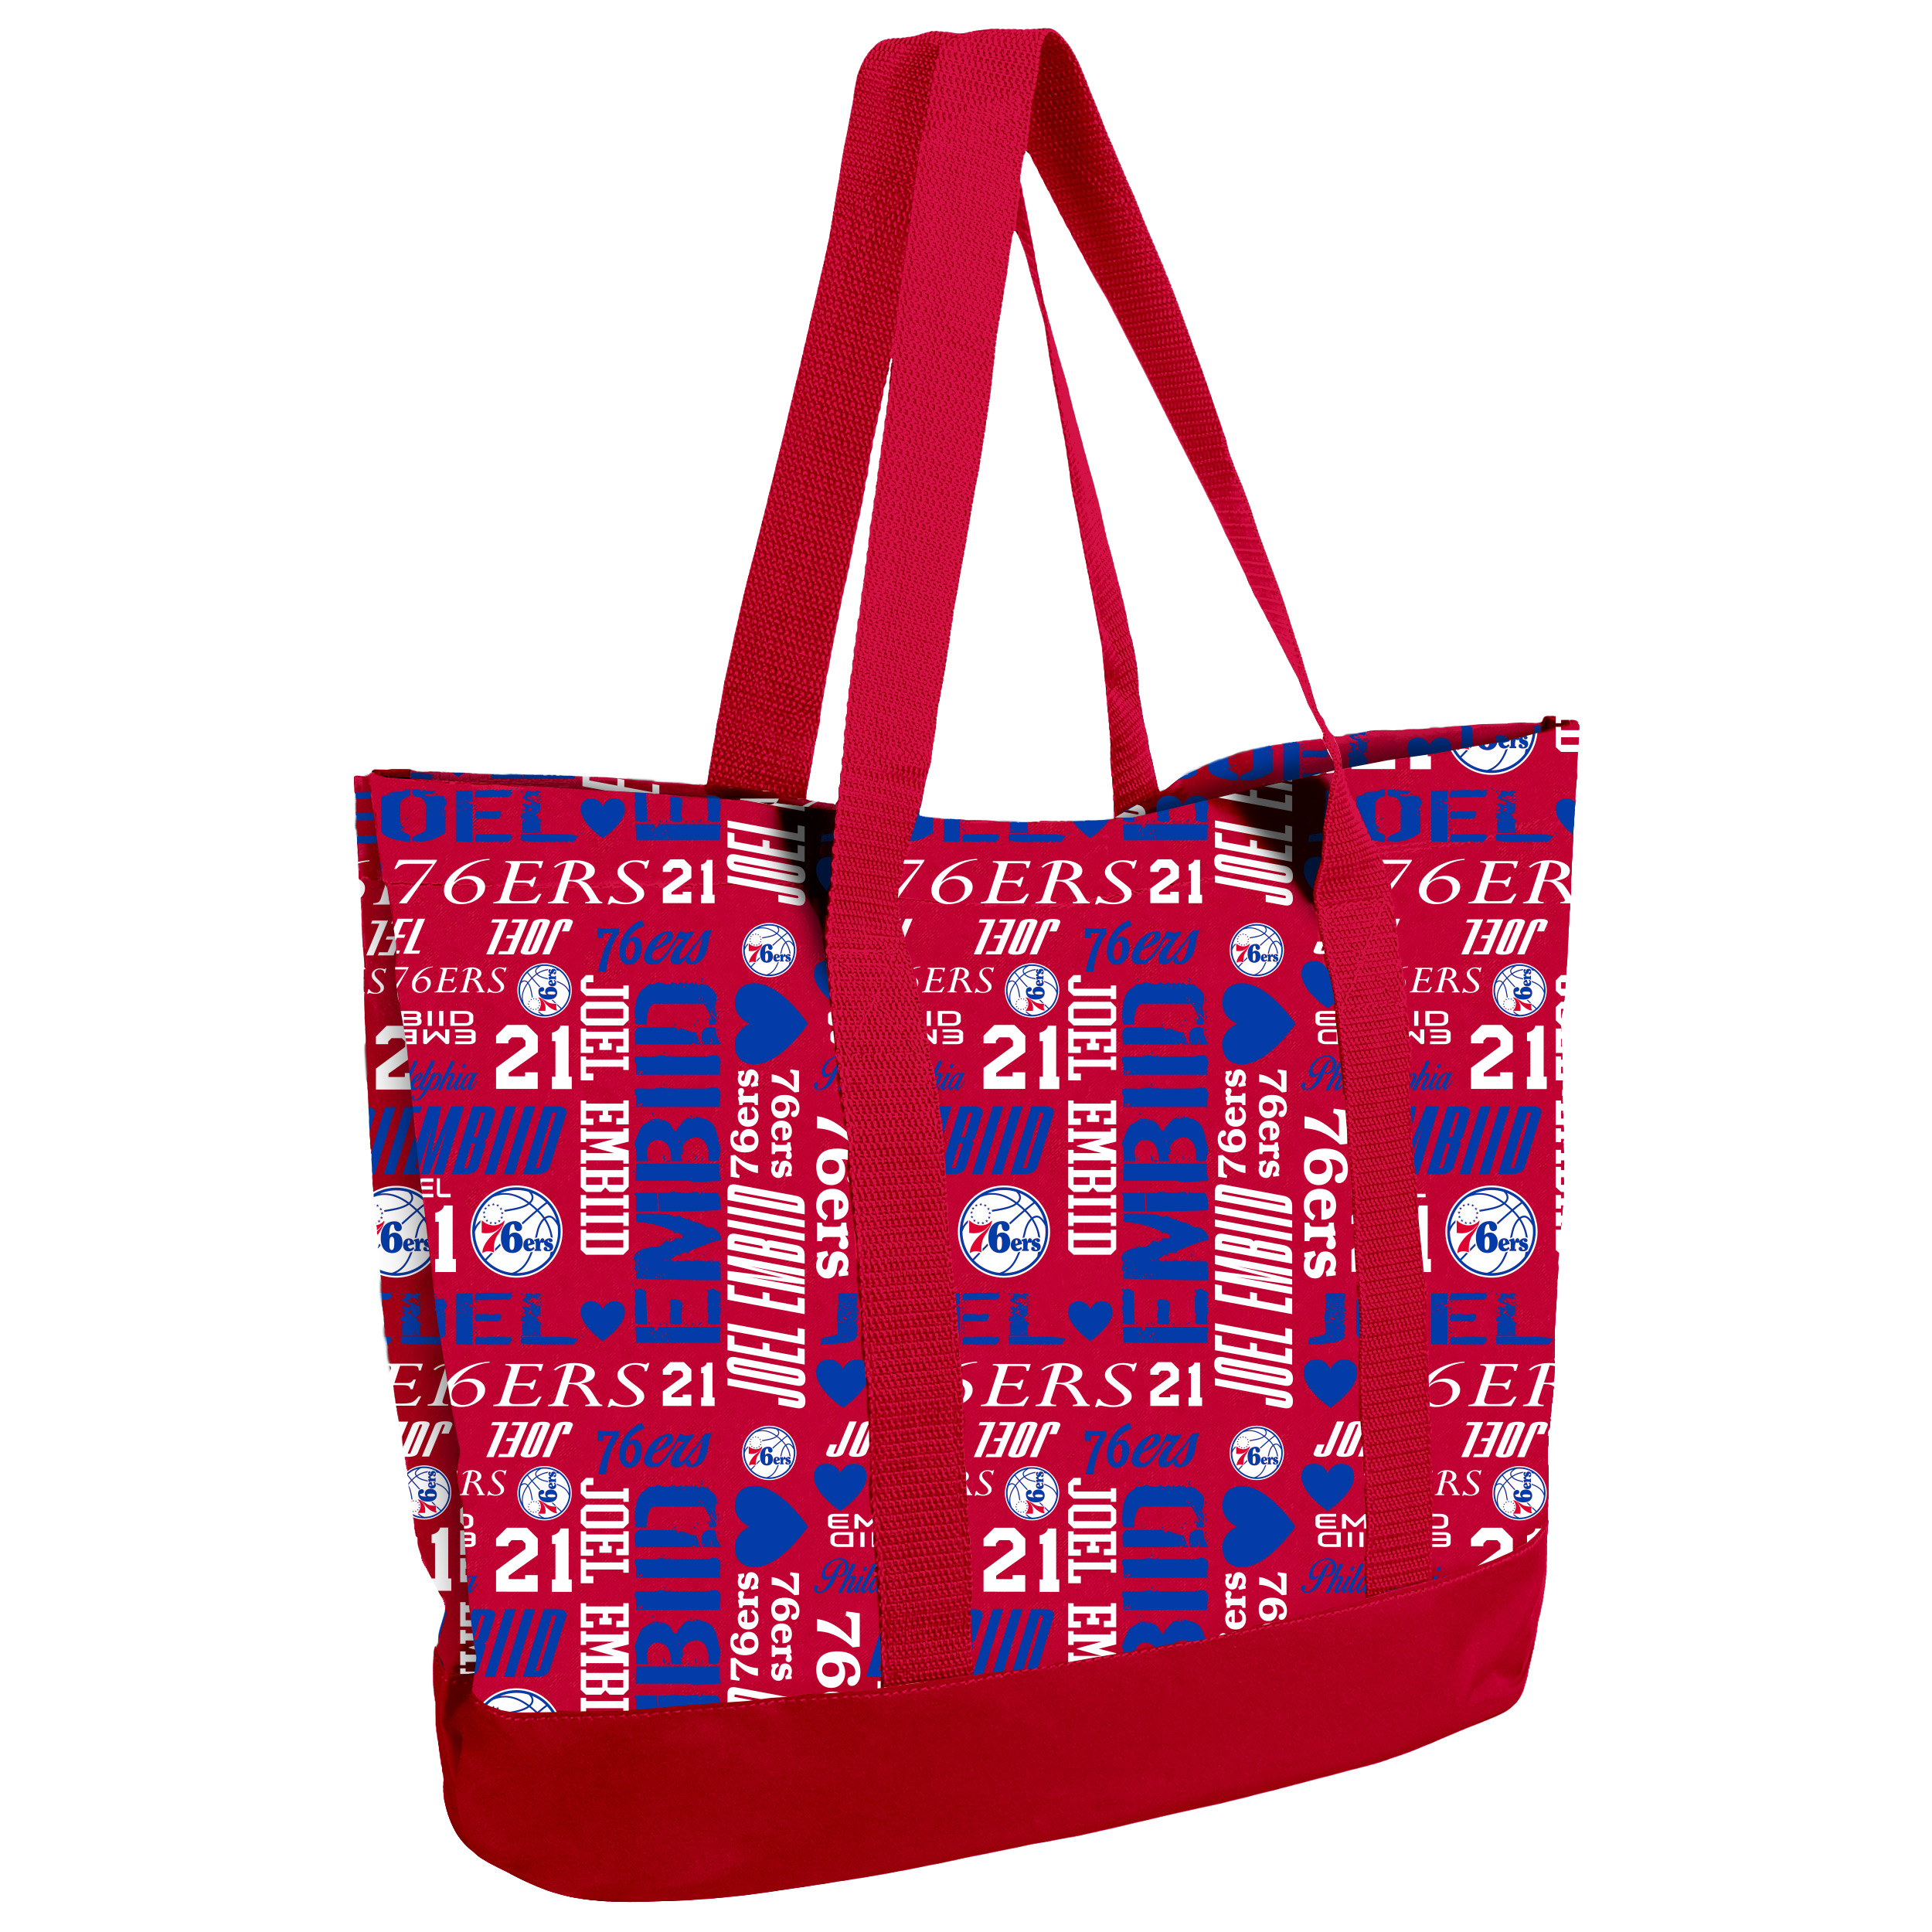 Joel Embiid Philadelphia 76ers Women's Player Collage Tote Bag